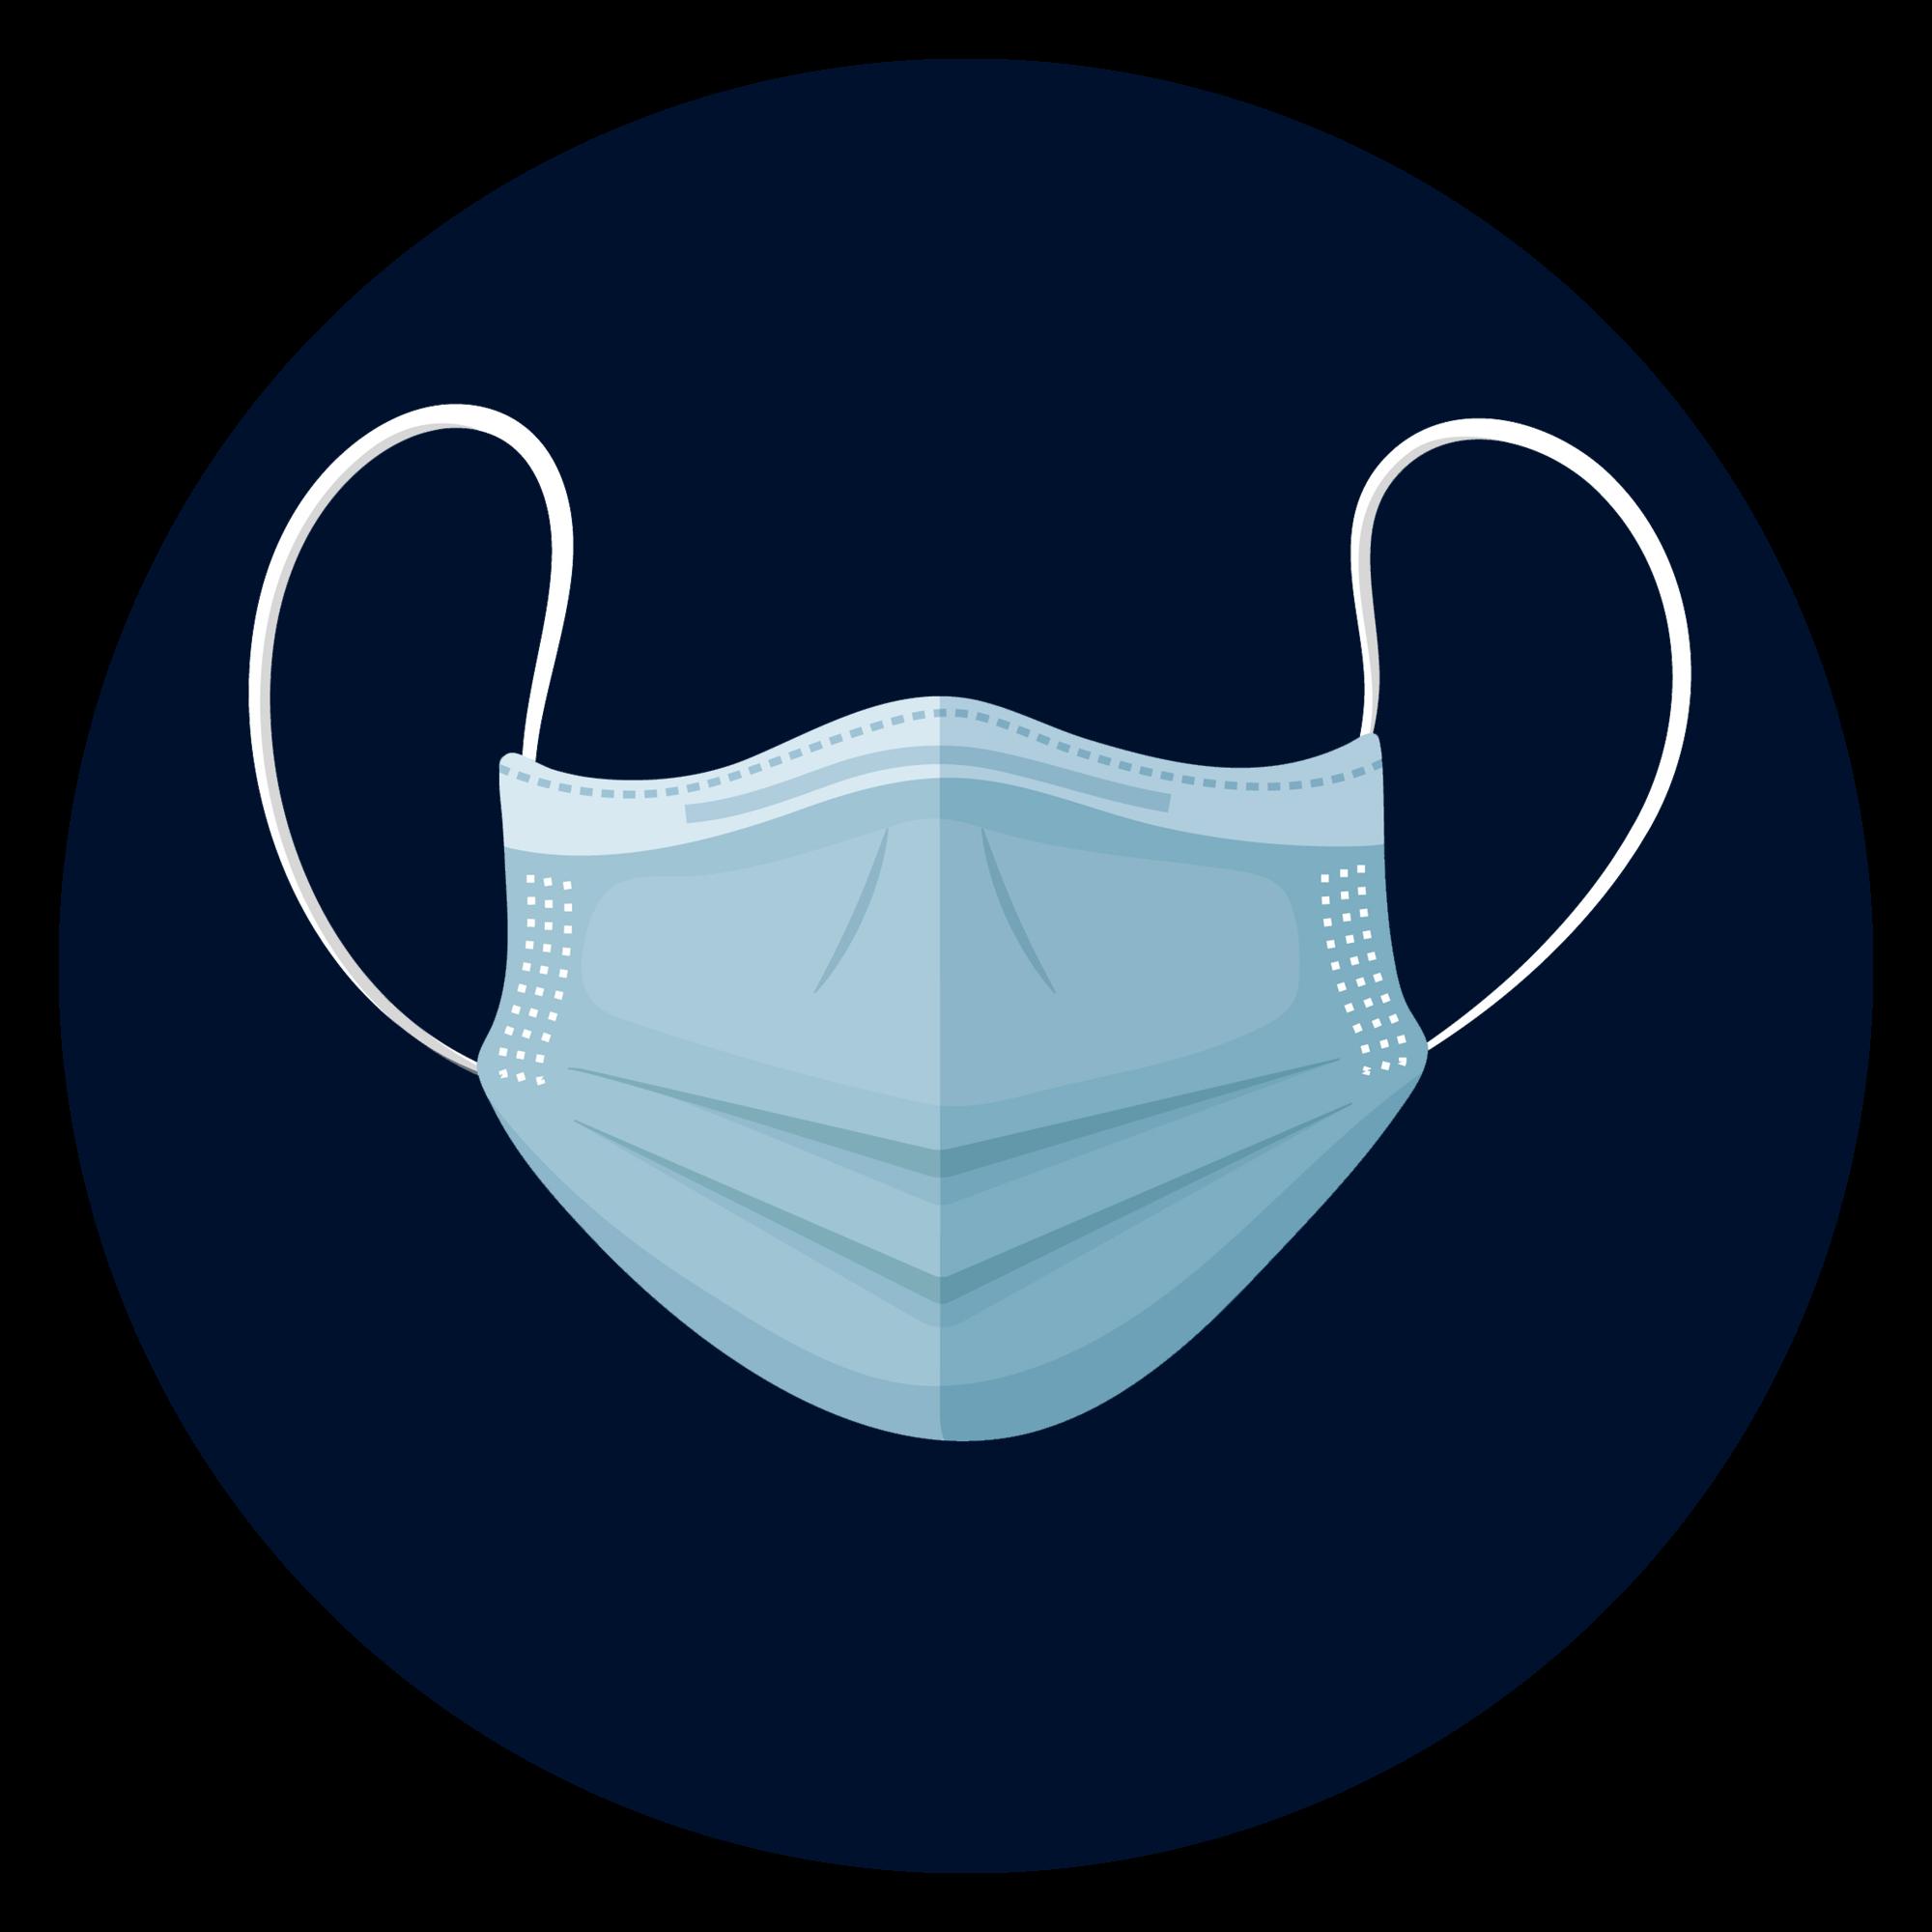 Logo masque de protection contre le covid-19